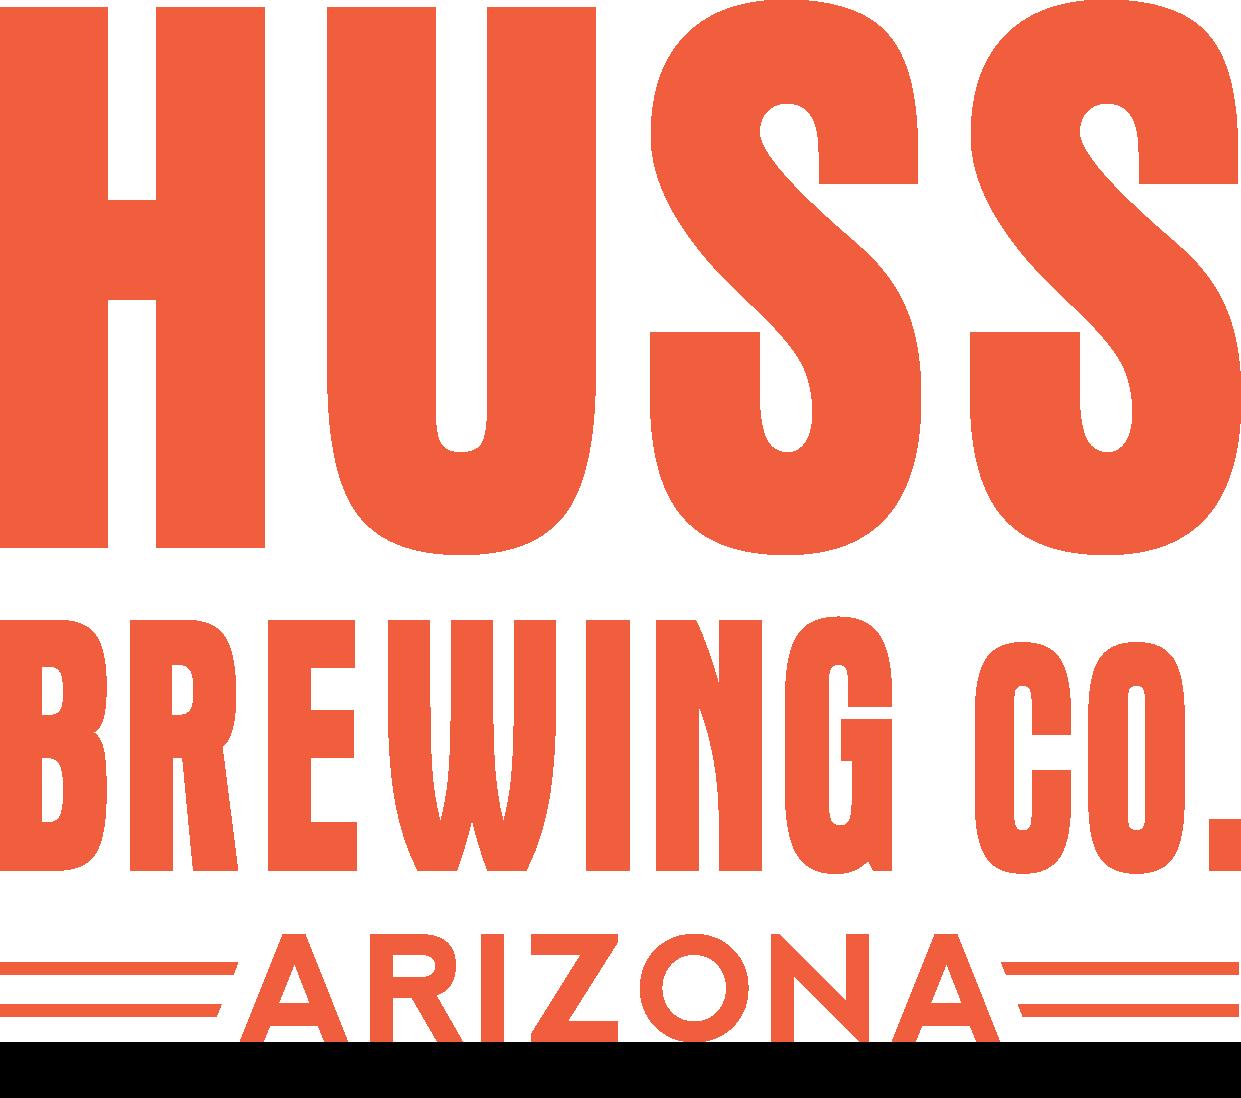 huss brewing co. arizona logo